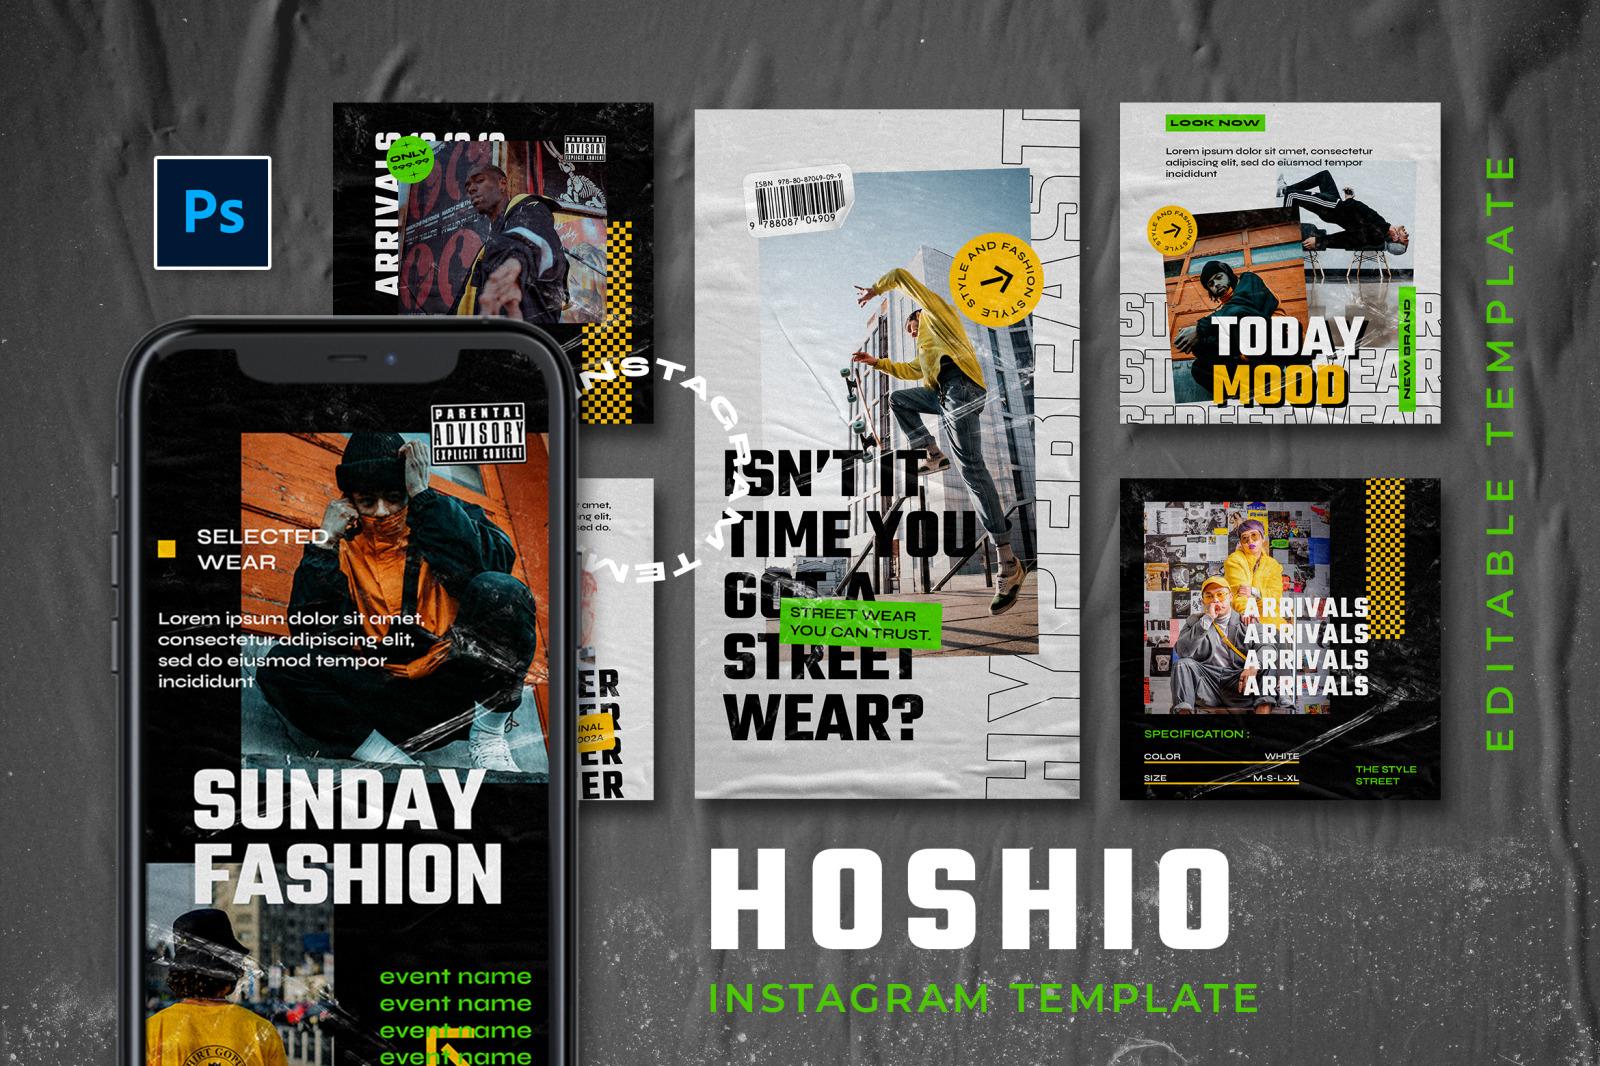 Hoshio Instagram Template